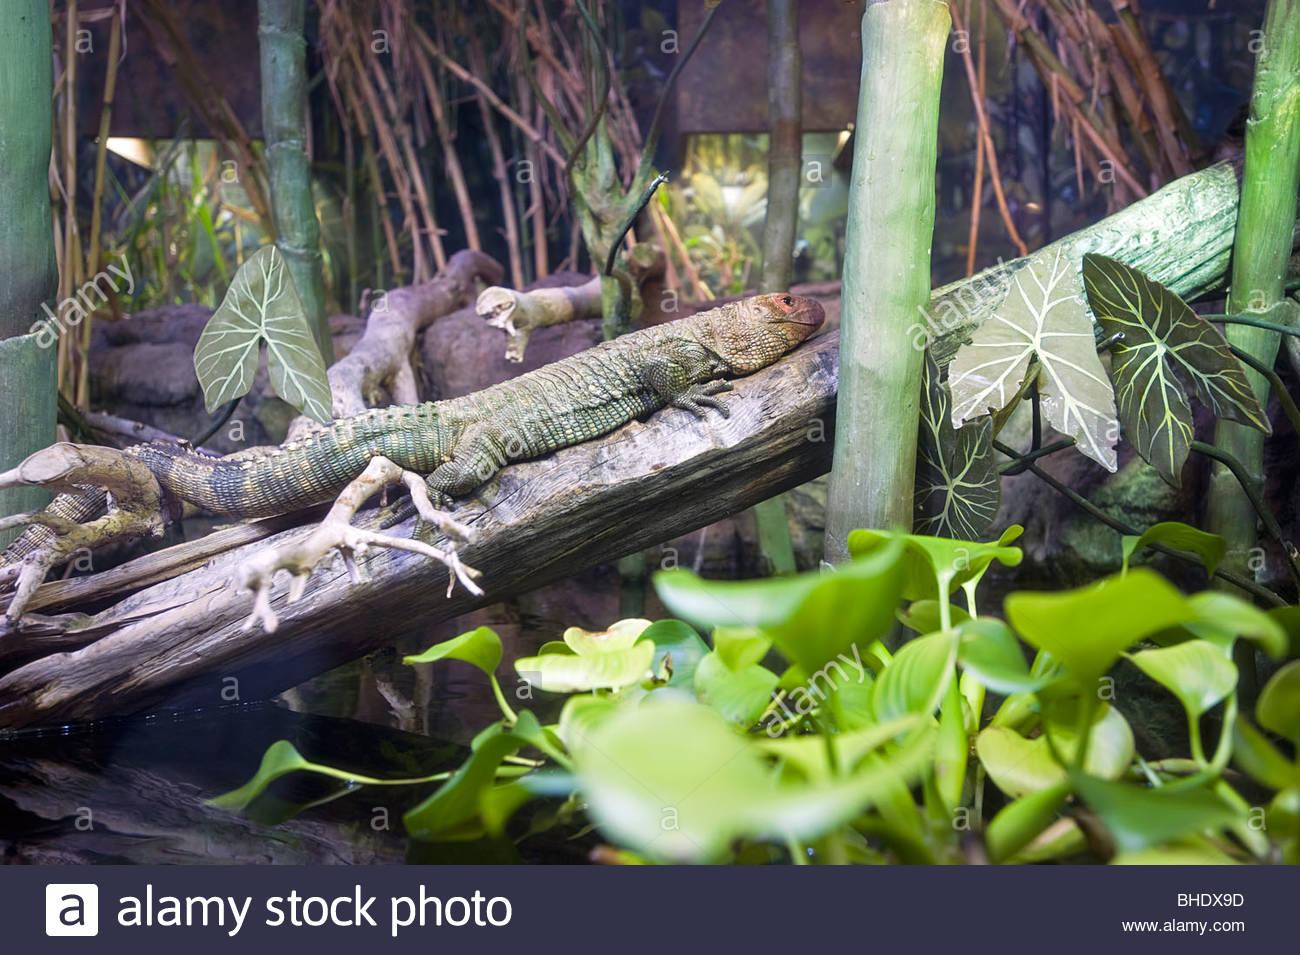 Iguana from central America at the Shedd Aquarium. Chicago, illinois, usa - Stock Image